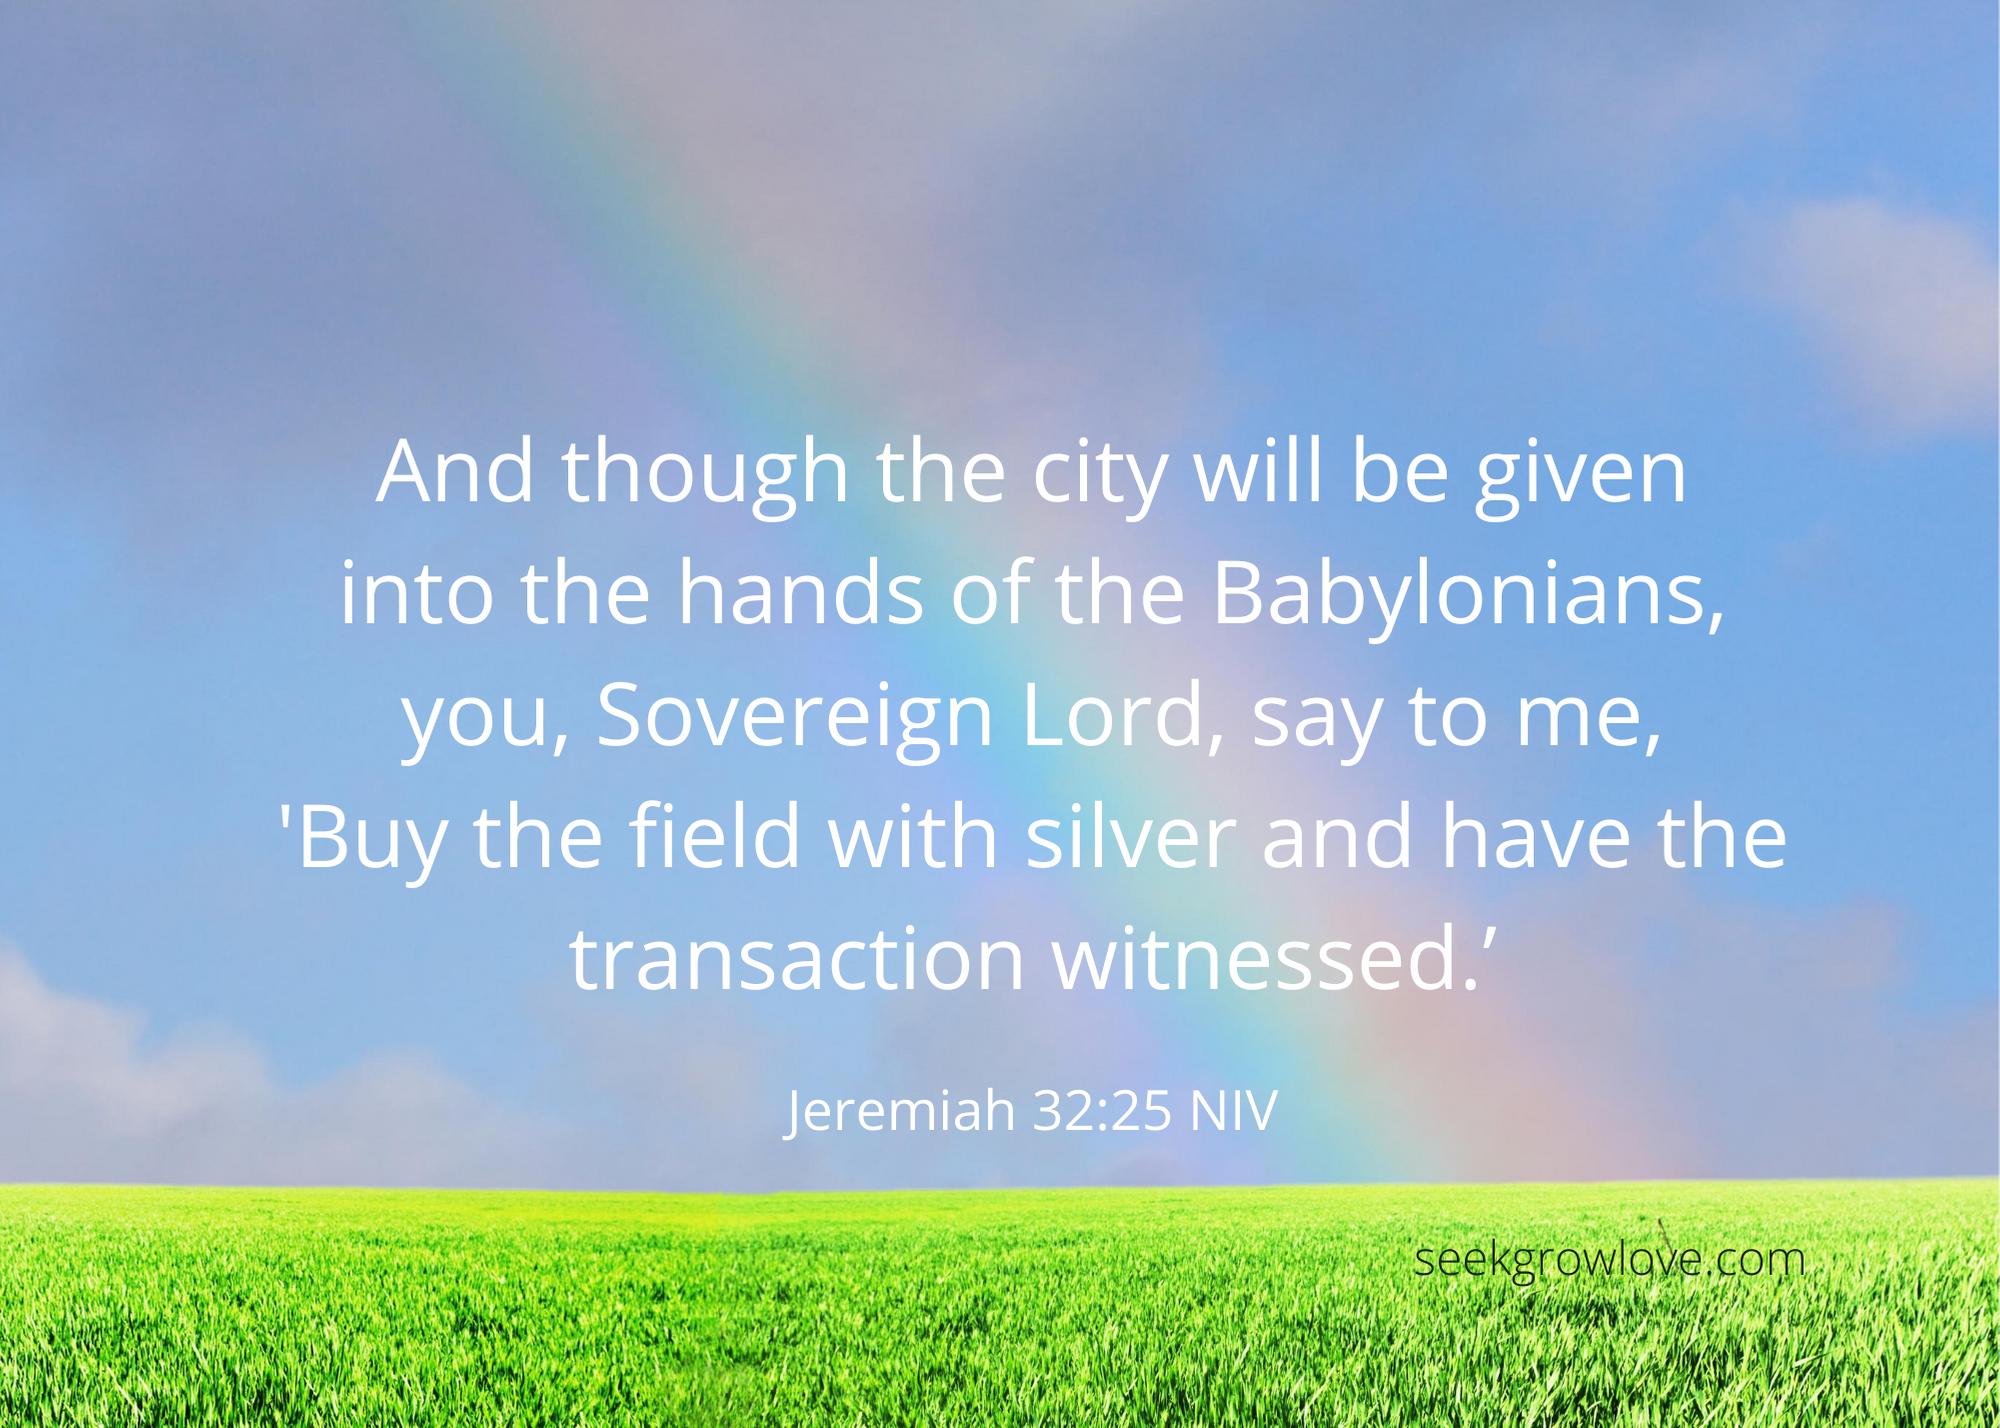 Jeremiah 32 25 NIV sgl